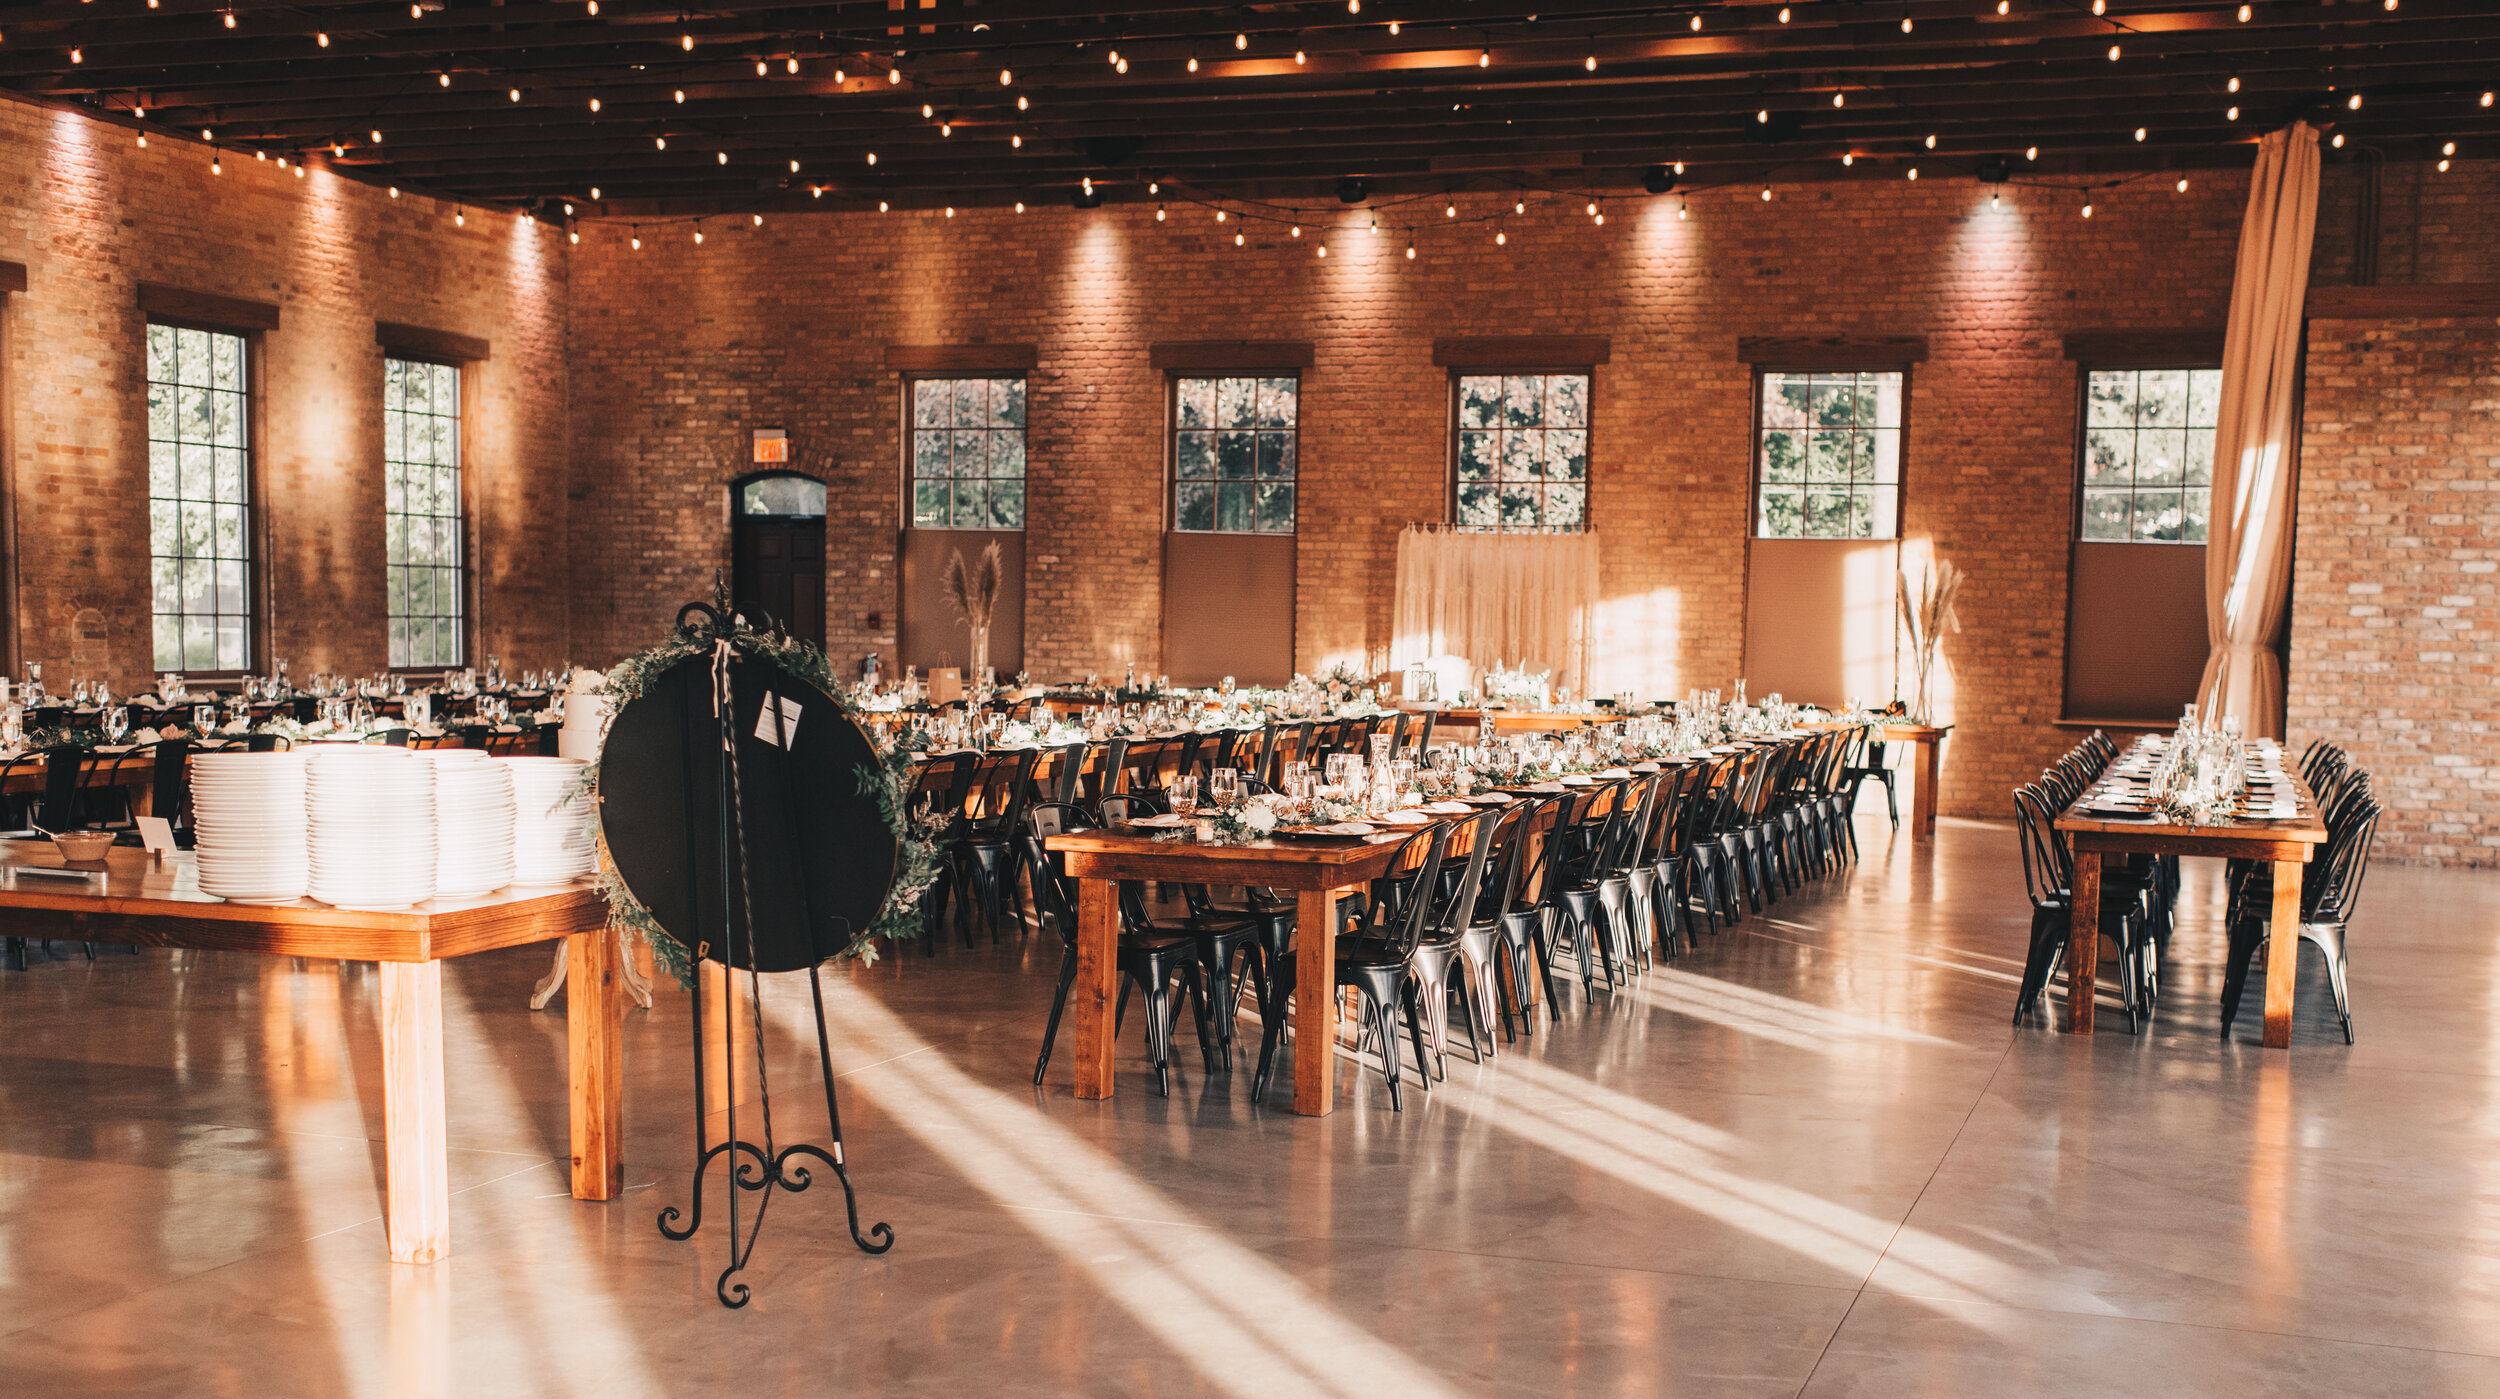 Modern Industrial Wedding, The Brix on the Fox, The BRIX, Chicago Industrial Wedding, Modern Midwest Wedding, The Brix on the Fox Wedding, The BRIX Wedding, Wedding Detail Photos